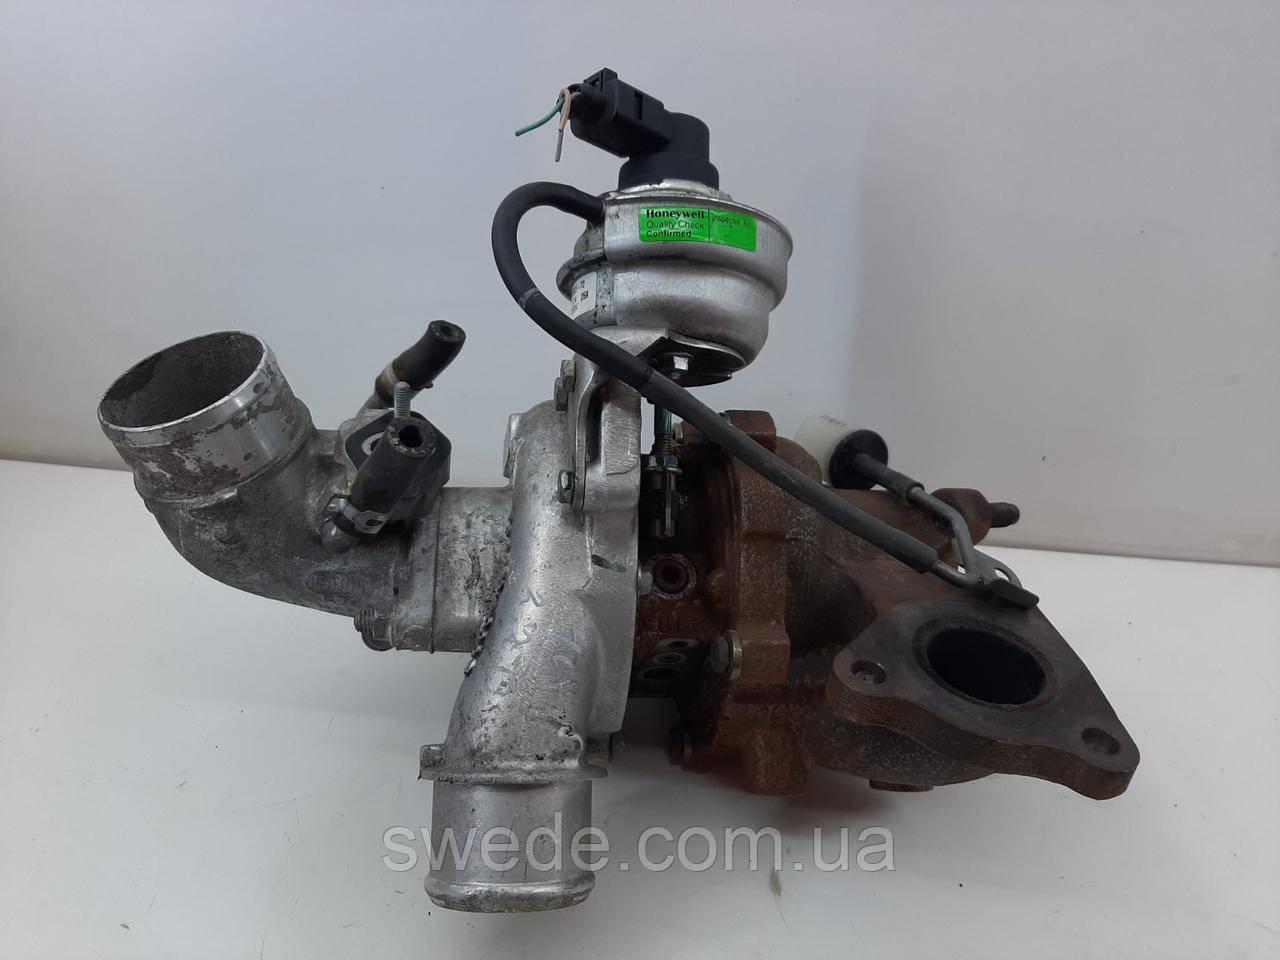 Турбина Honda CR-V 2.2 i-DTEC 2013-2018 гг 18900RFWG011M2